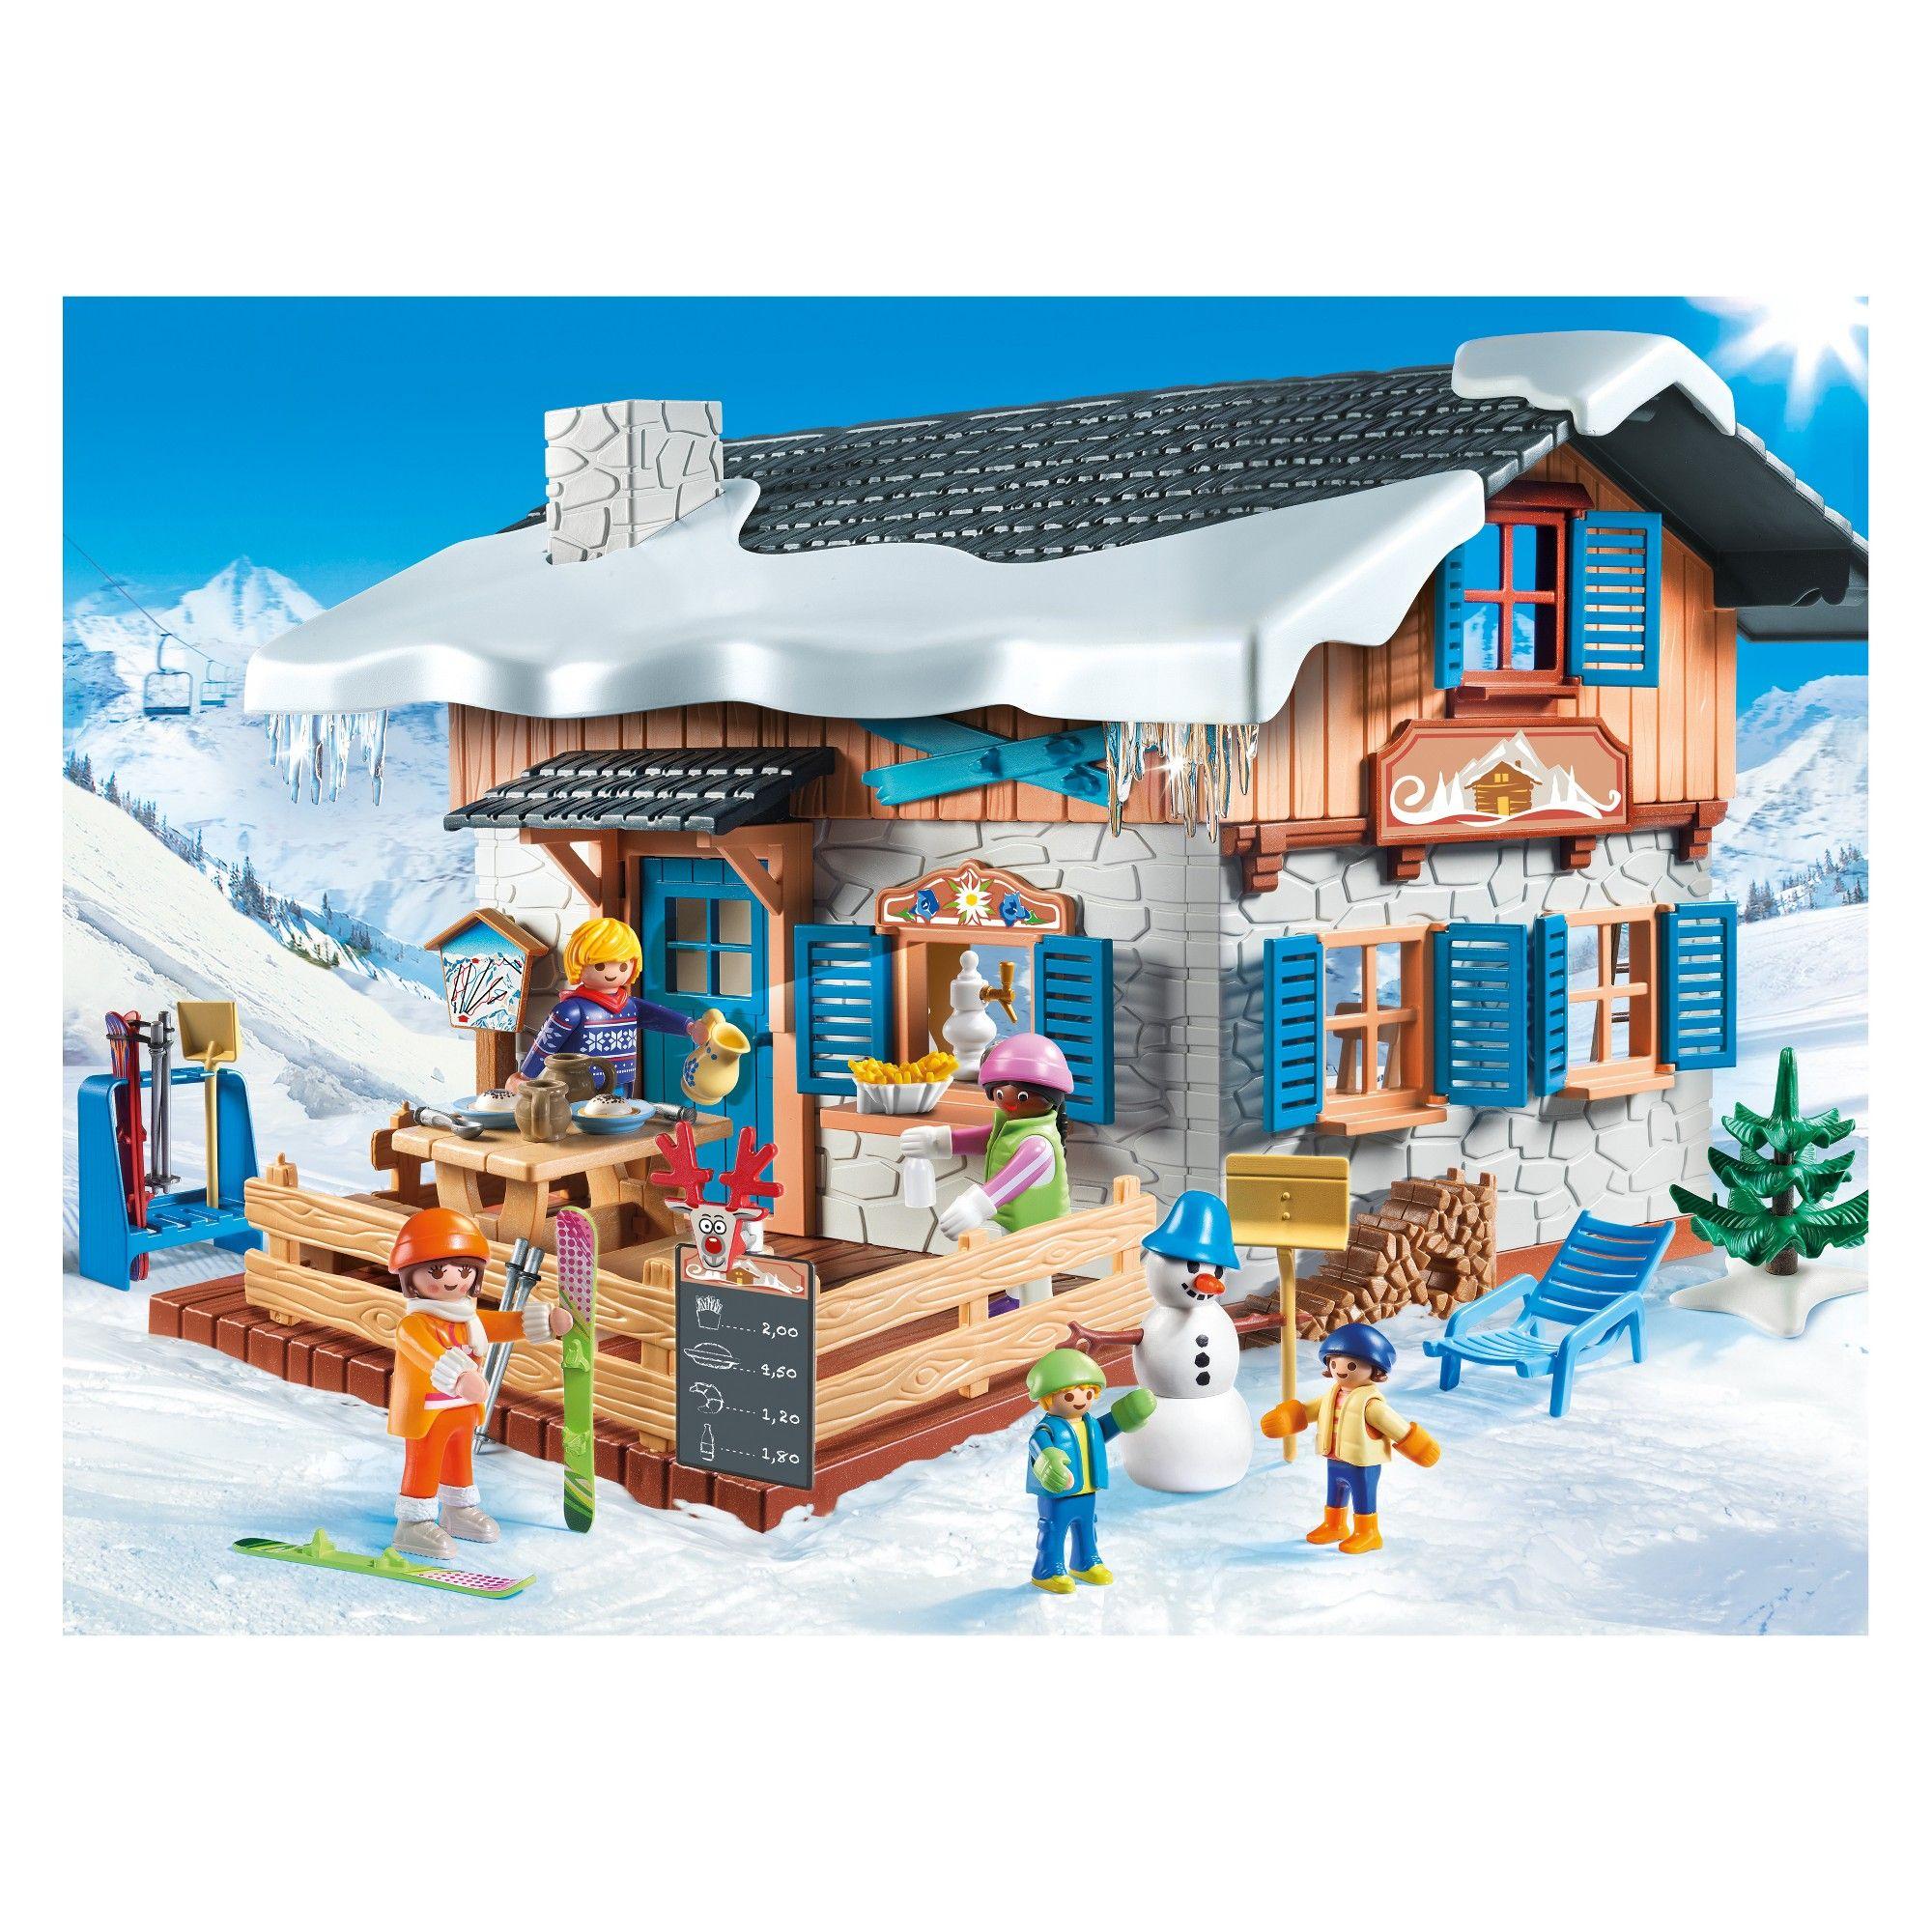 Playmobil Ski Lodge, mini figures Playmobil, Skiing, Lodges